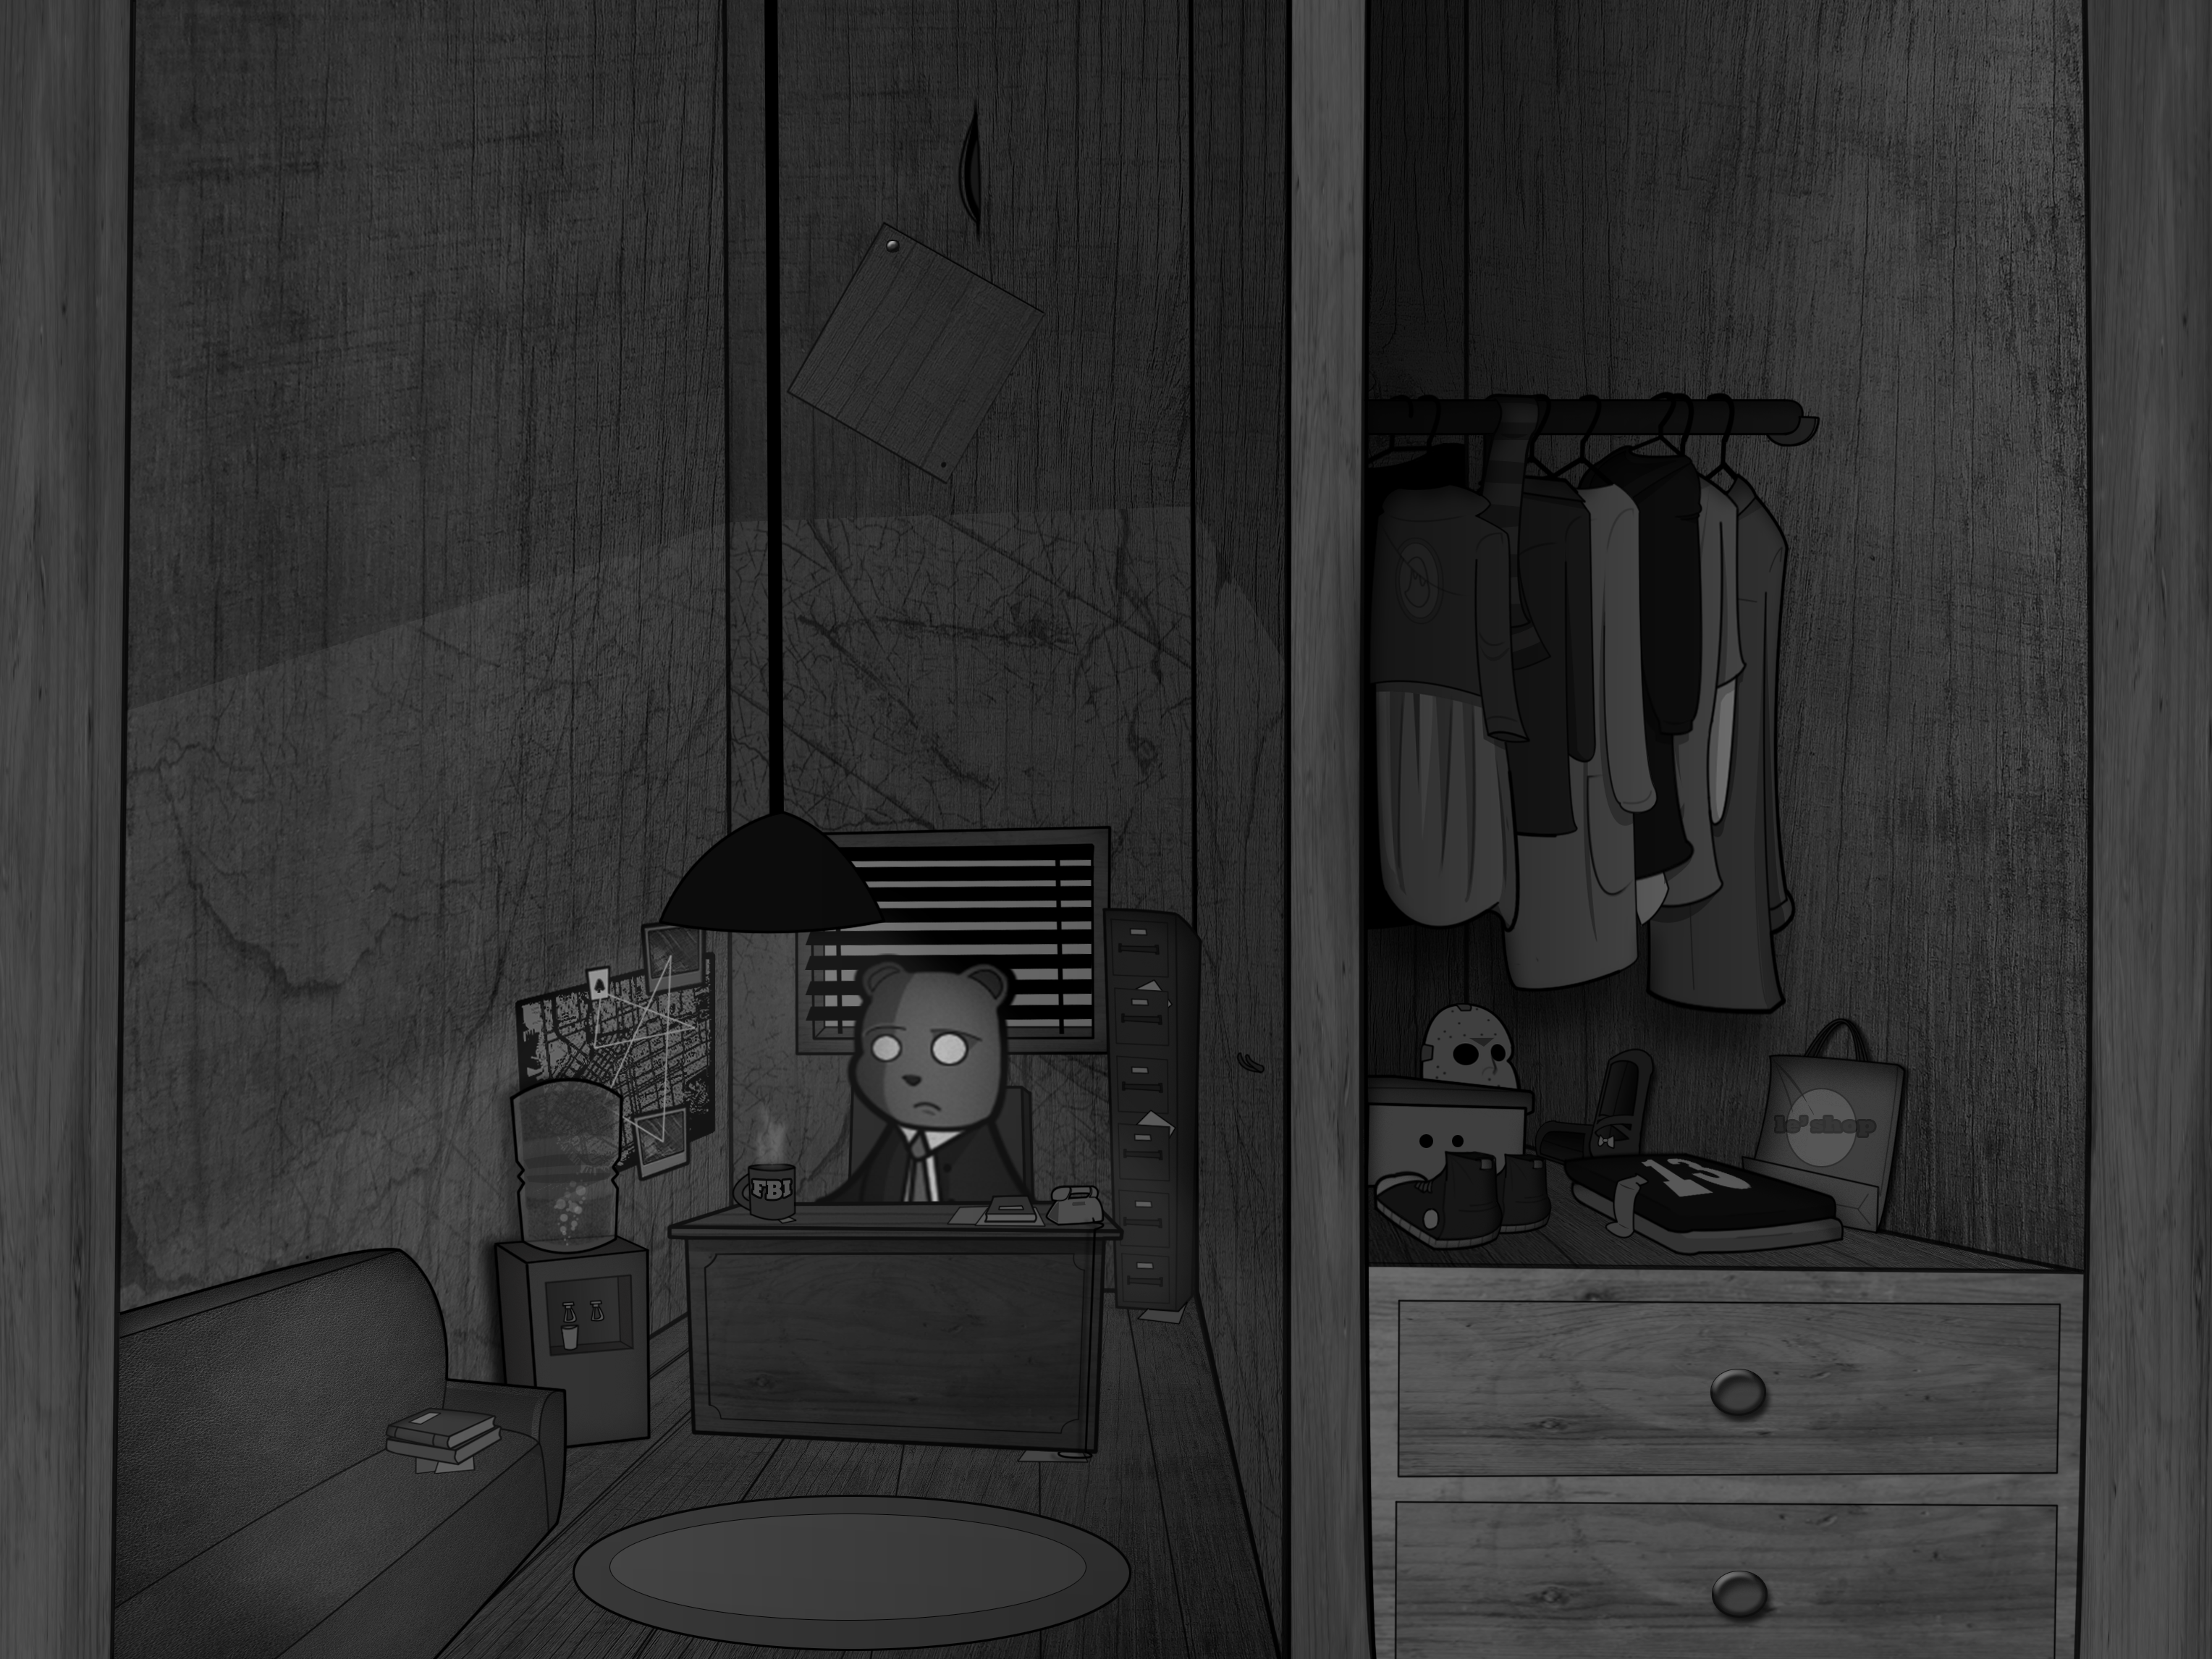 asko closet from black alexandrialitras your diy whirlpool steam steampunk key com